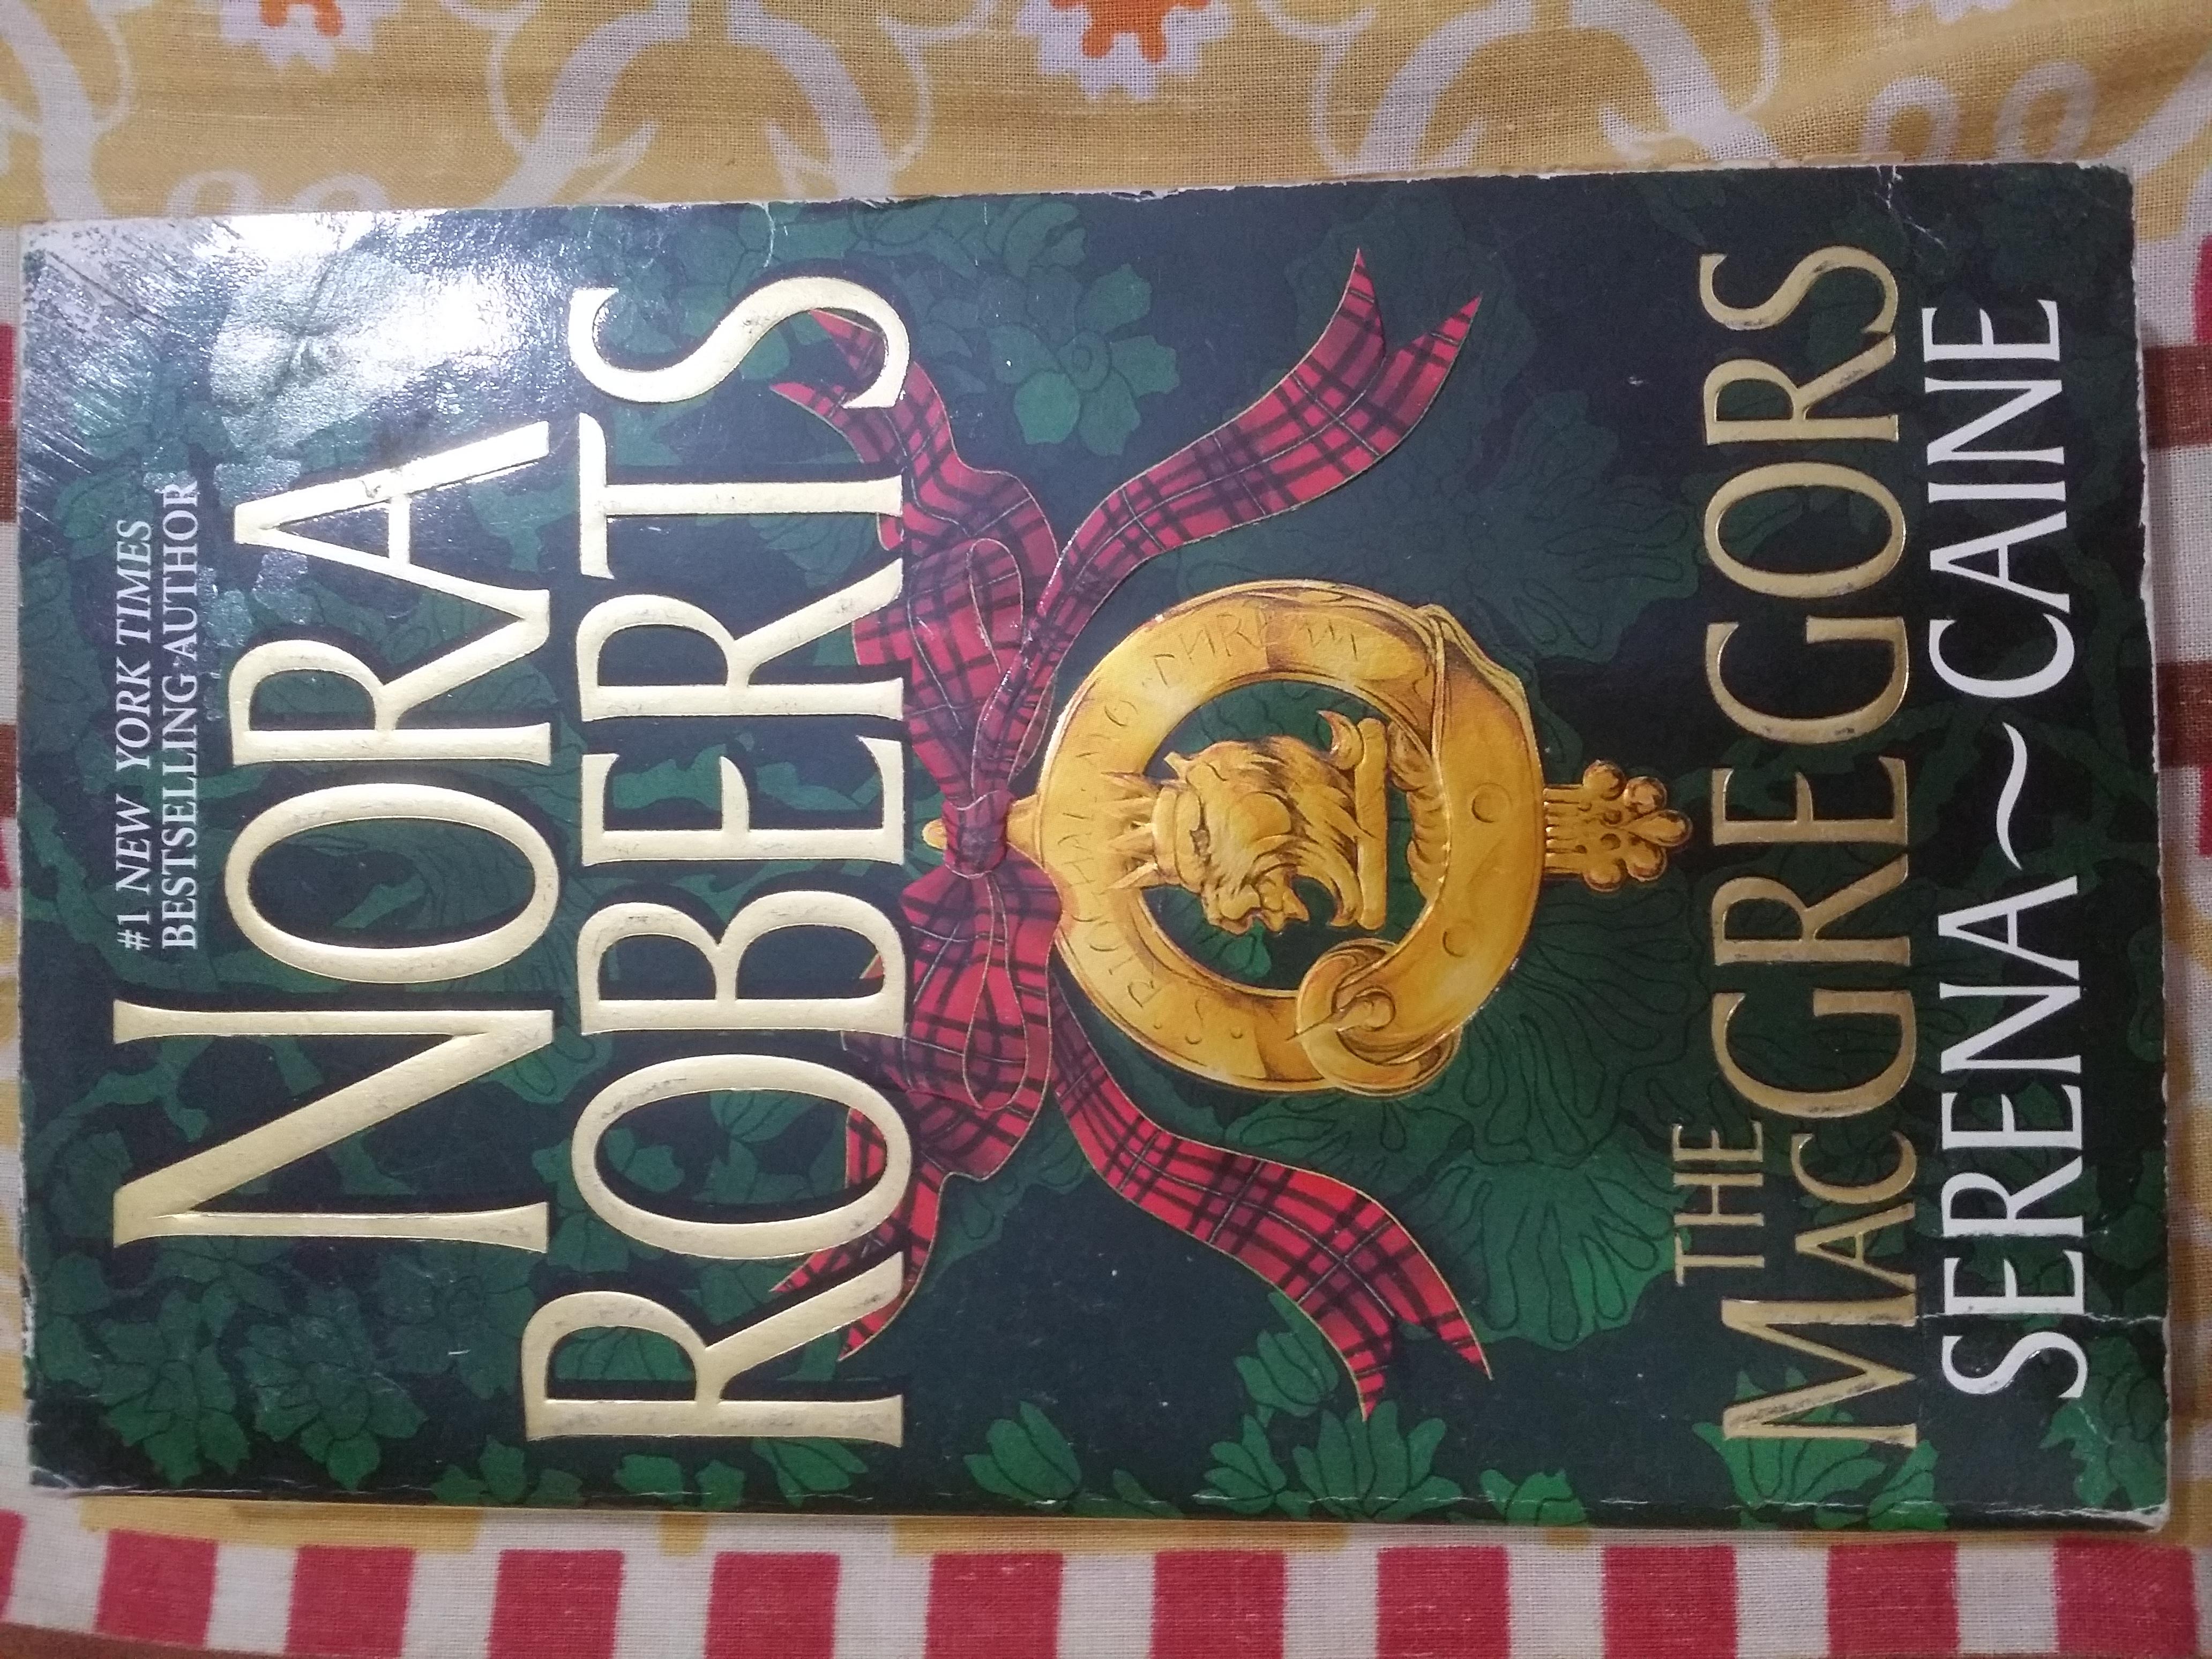 nora roberts - the macgregors